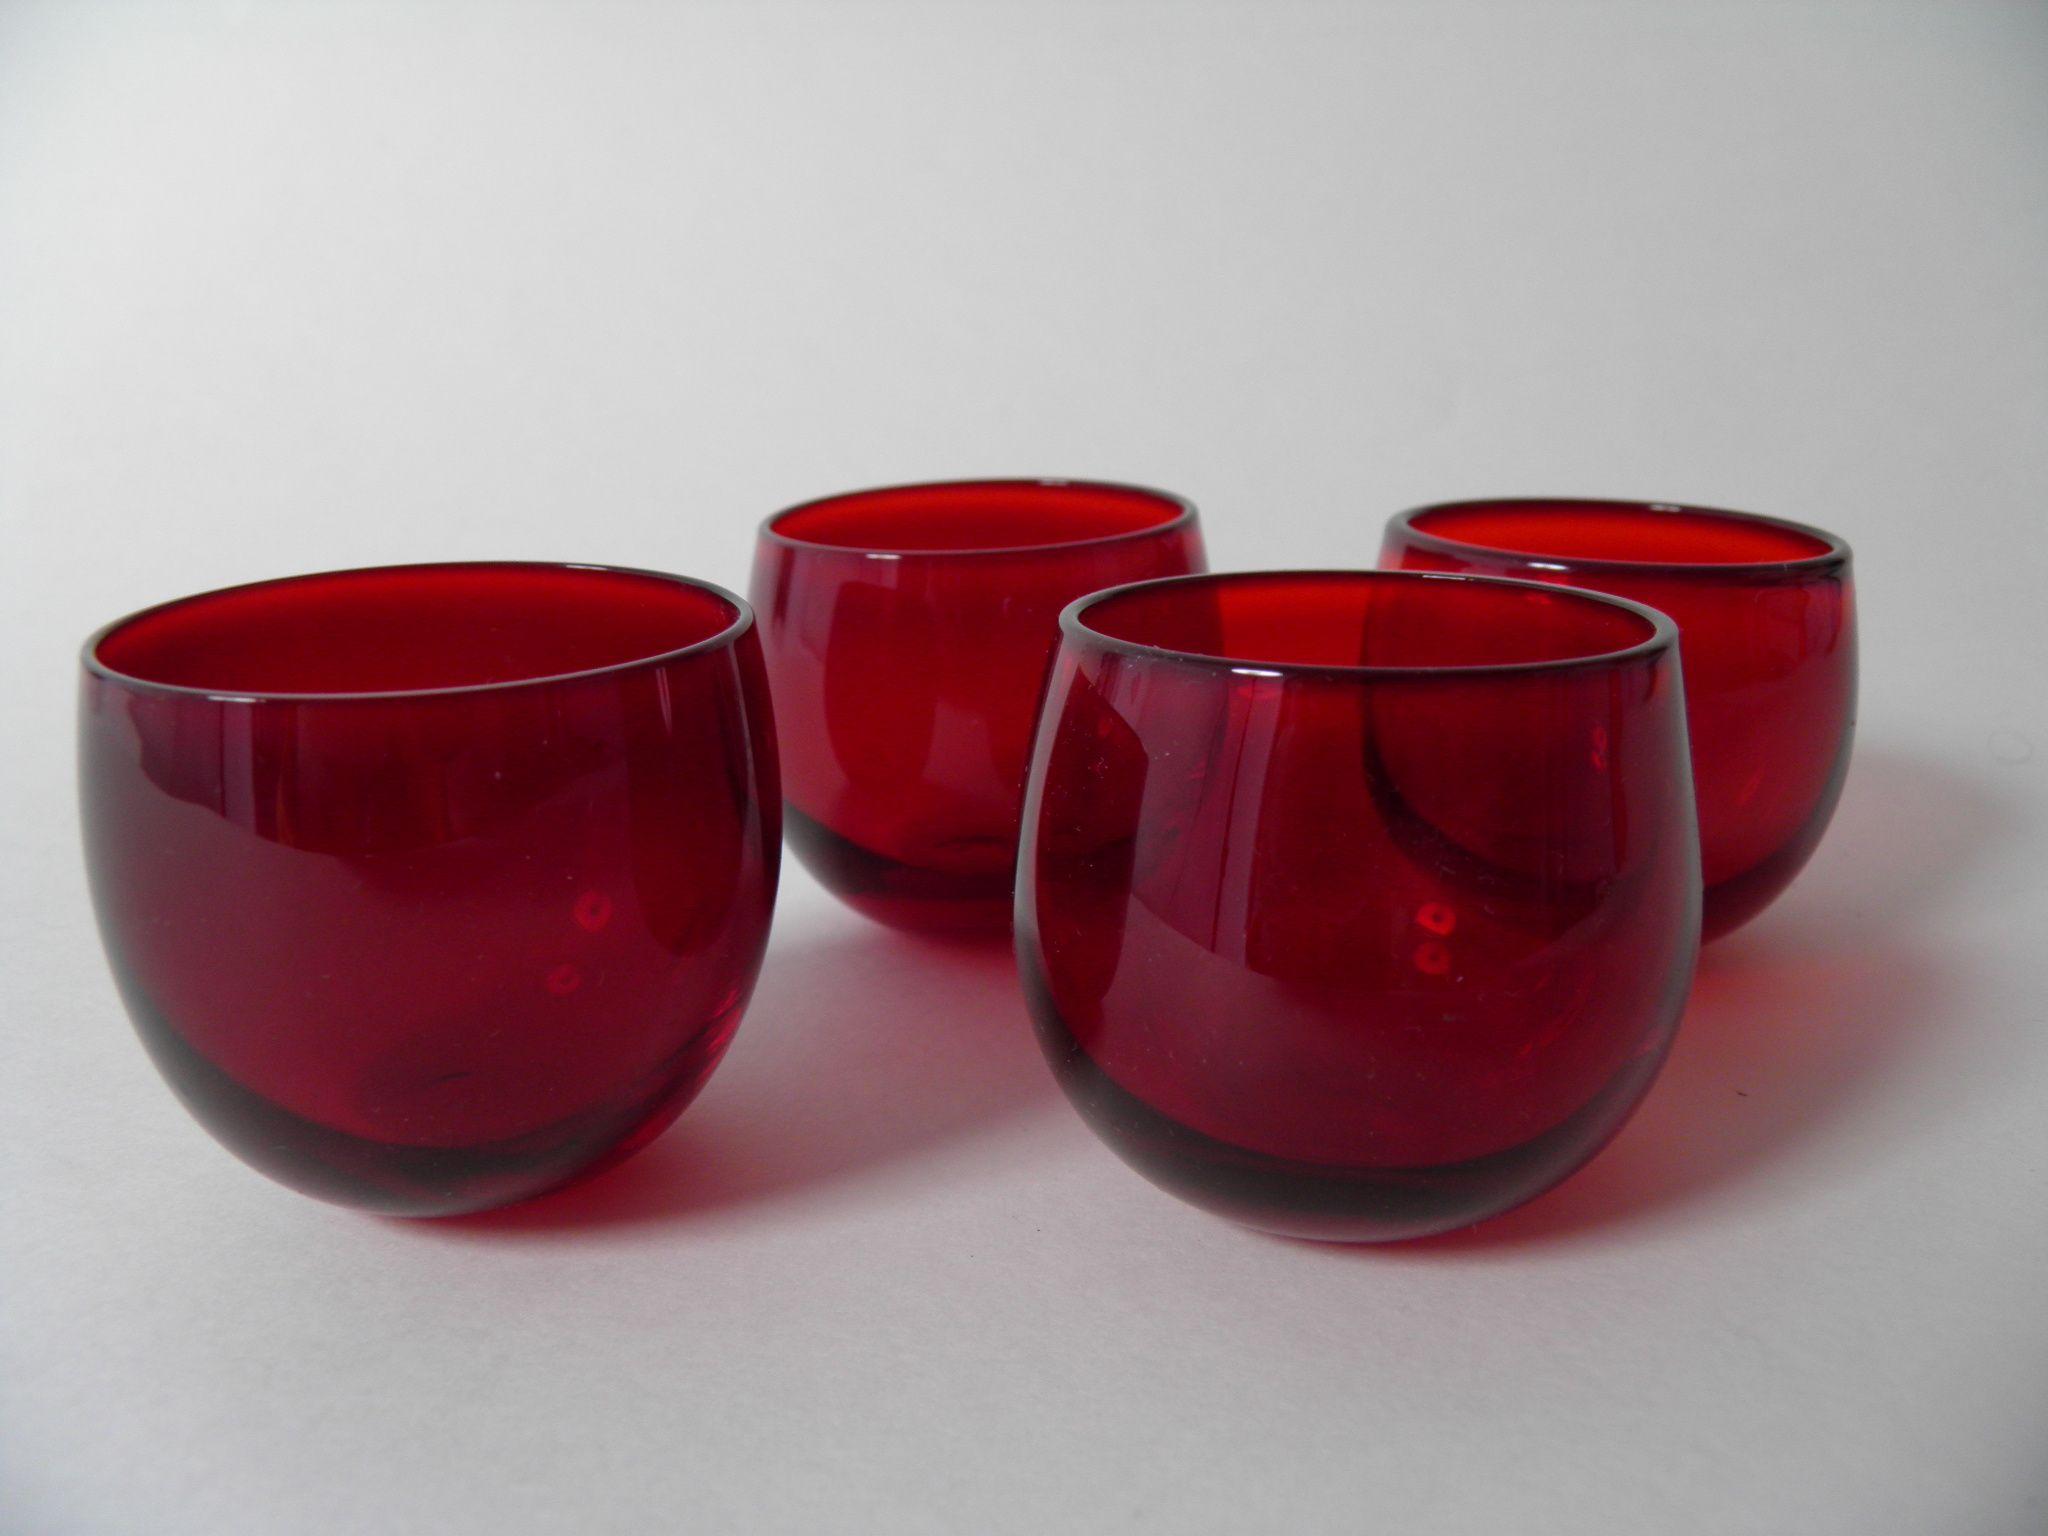 Marja Glasses Nuutajarvi Saara Hopea In 2020 Wine Tasting Glasses Clear Glass Tumbler Stemless Wine Glass